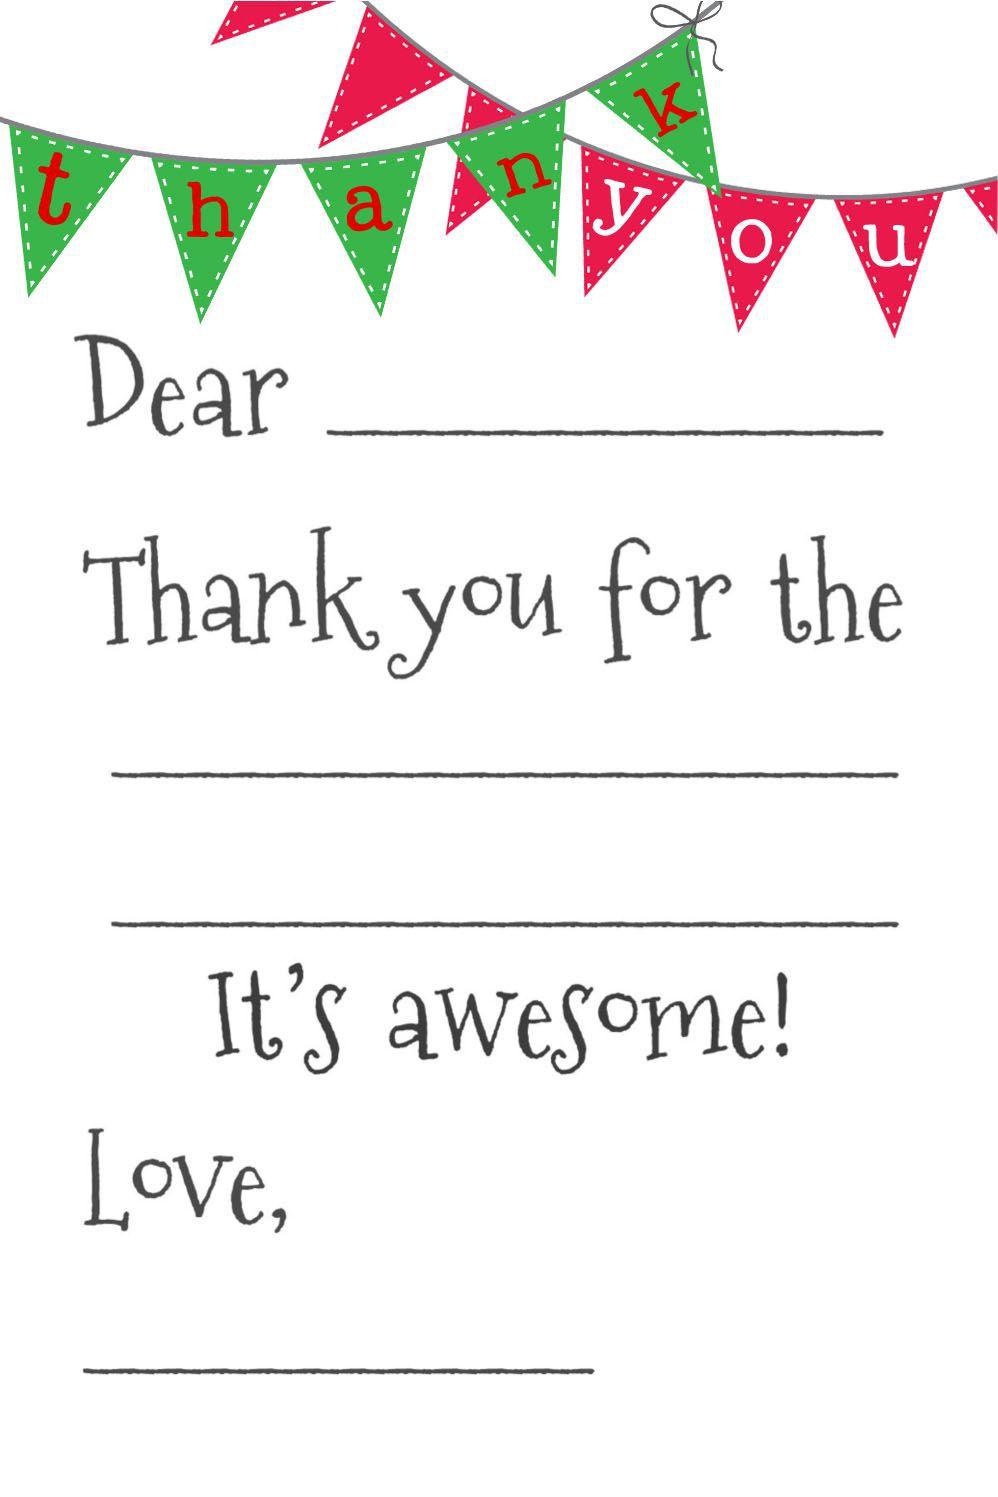 003 Amazing Thank You Note Template Free Sample  Poshmark Christma TeacherFull